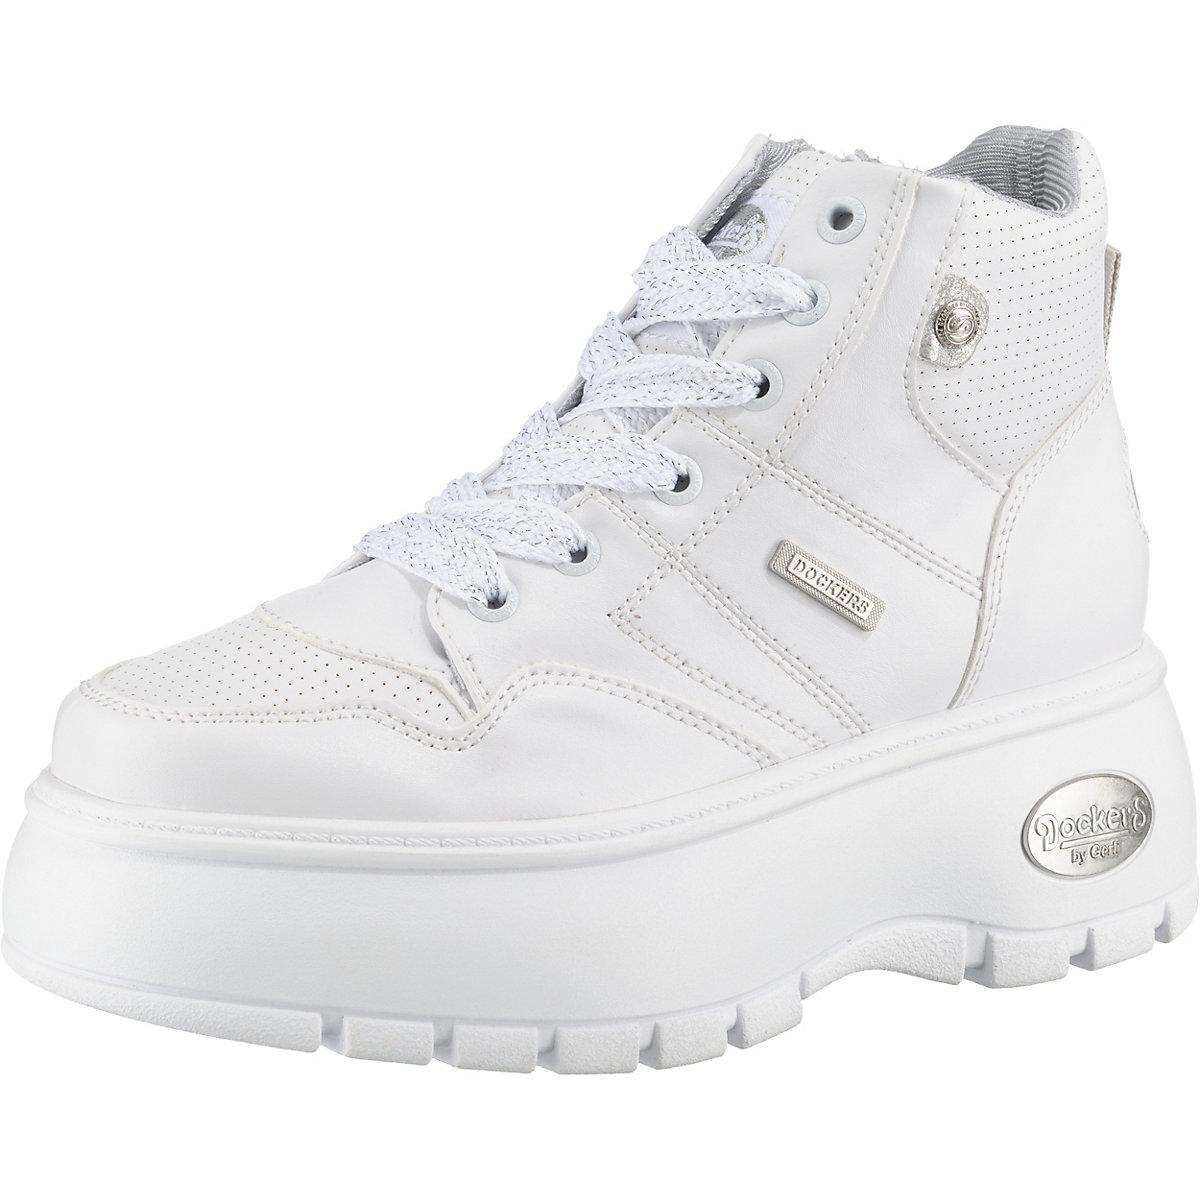 Dockers by Gerli, Turnschuhe High, weiß  Gute Qualität beliebte Schuhe